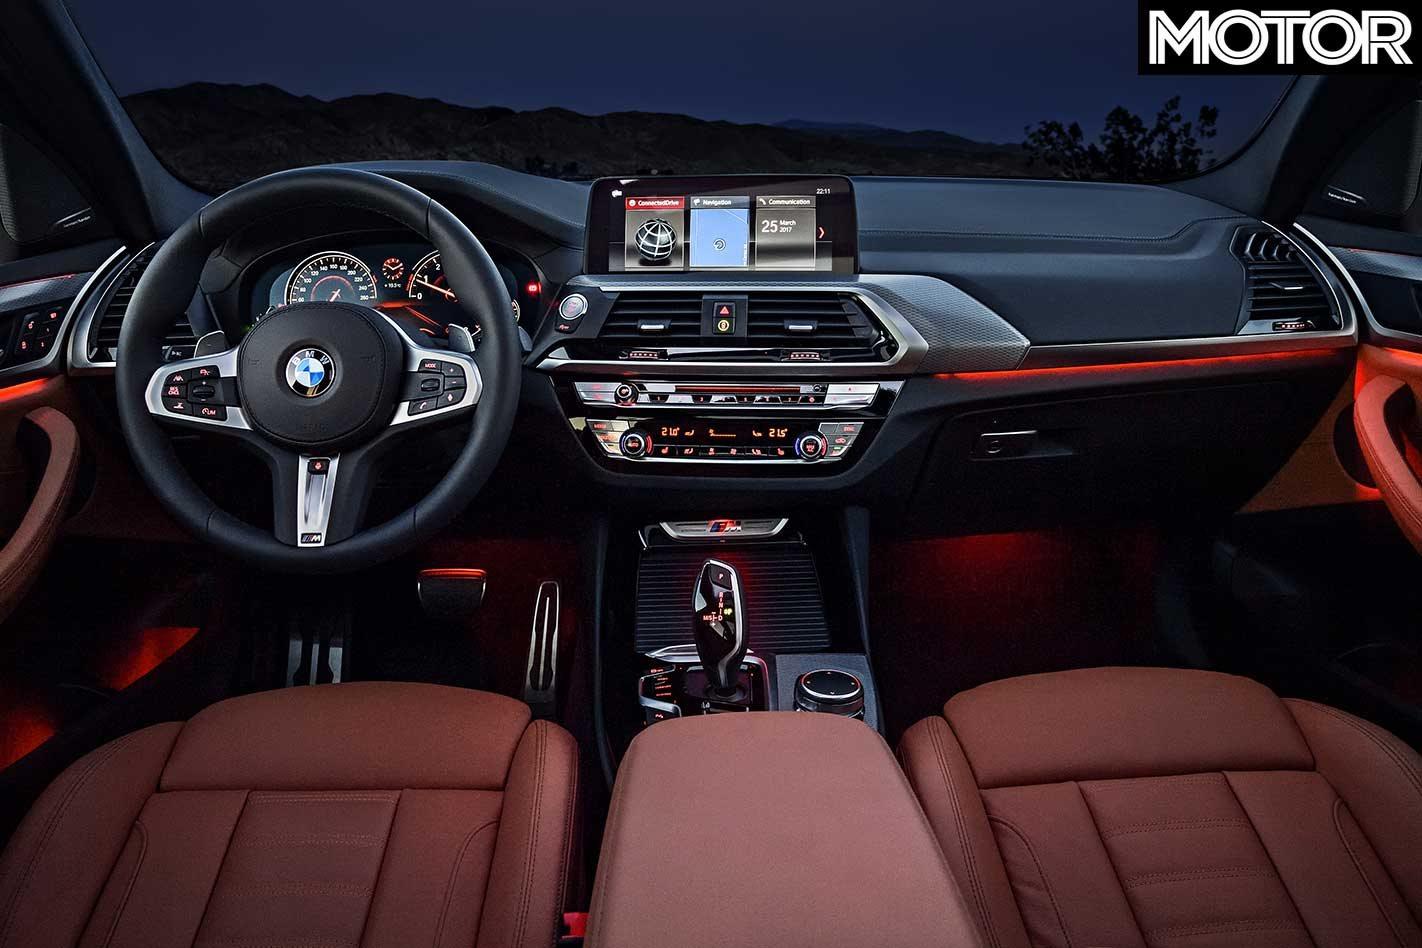 2019 BMW X3 M: V-6 Power, Design >> 2019 Bmw X3 M40i Performance Review